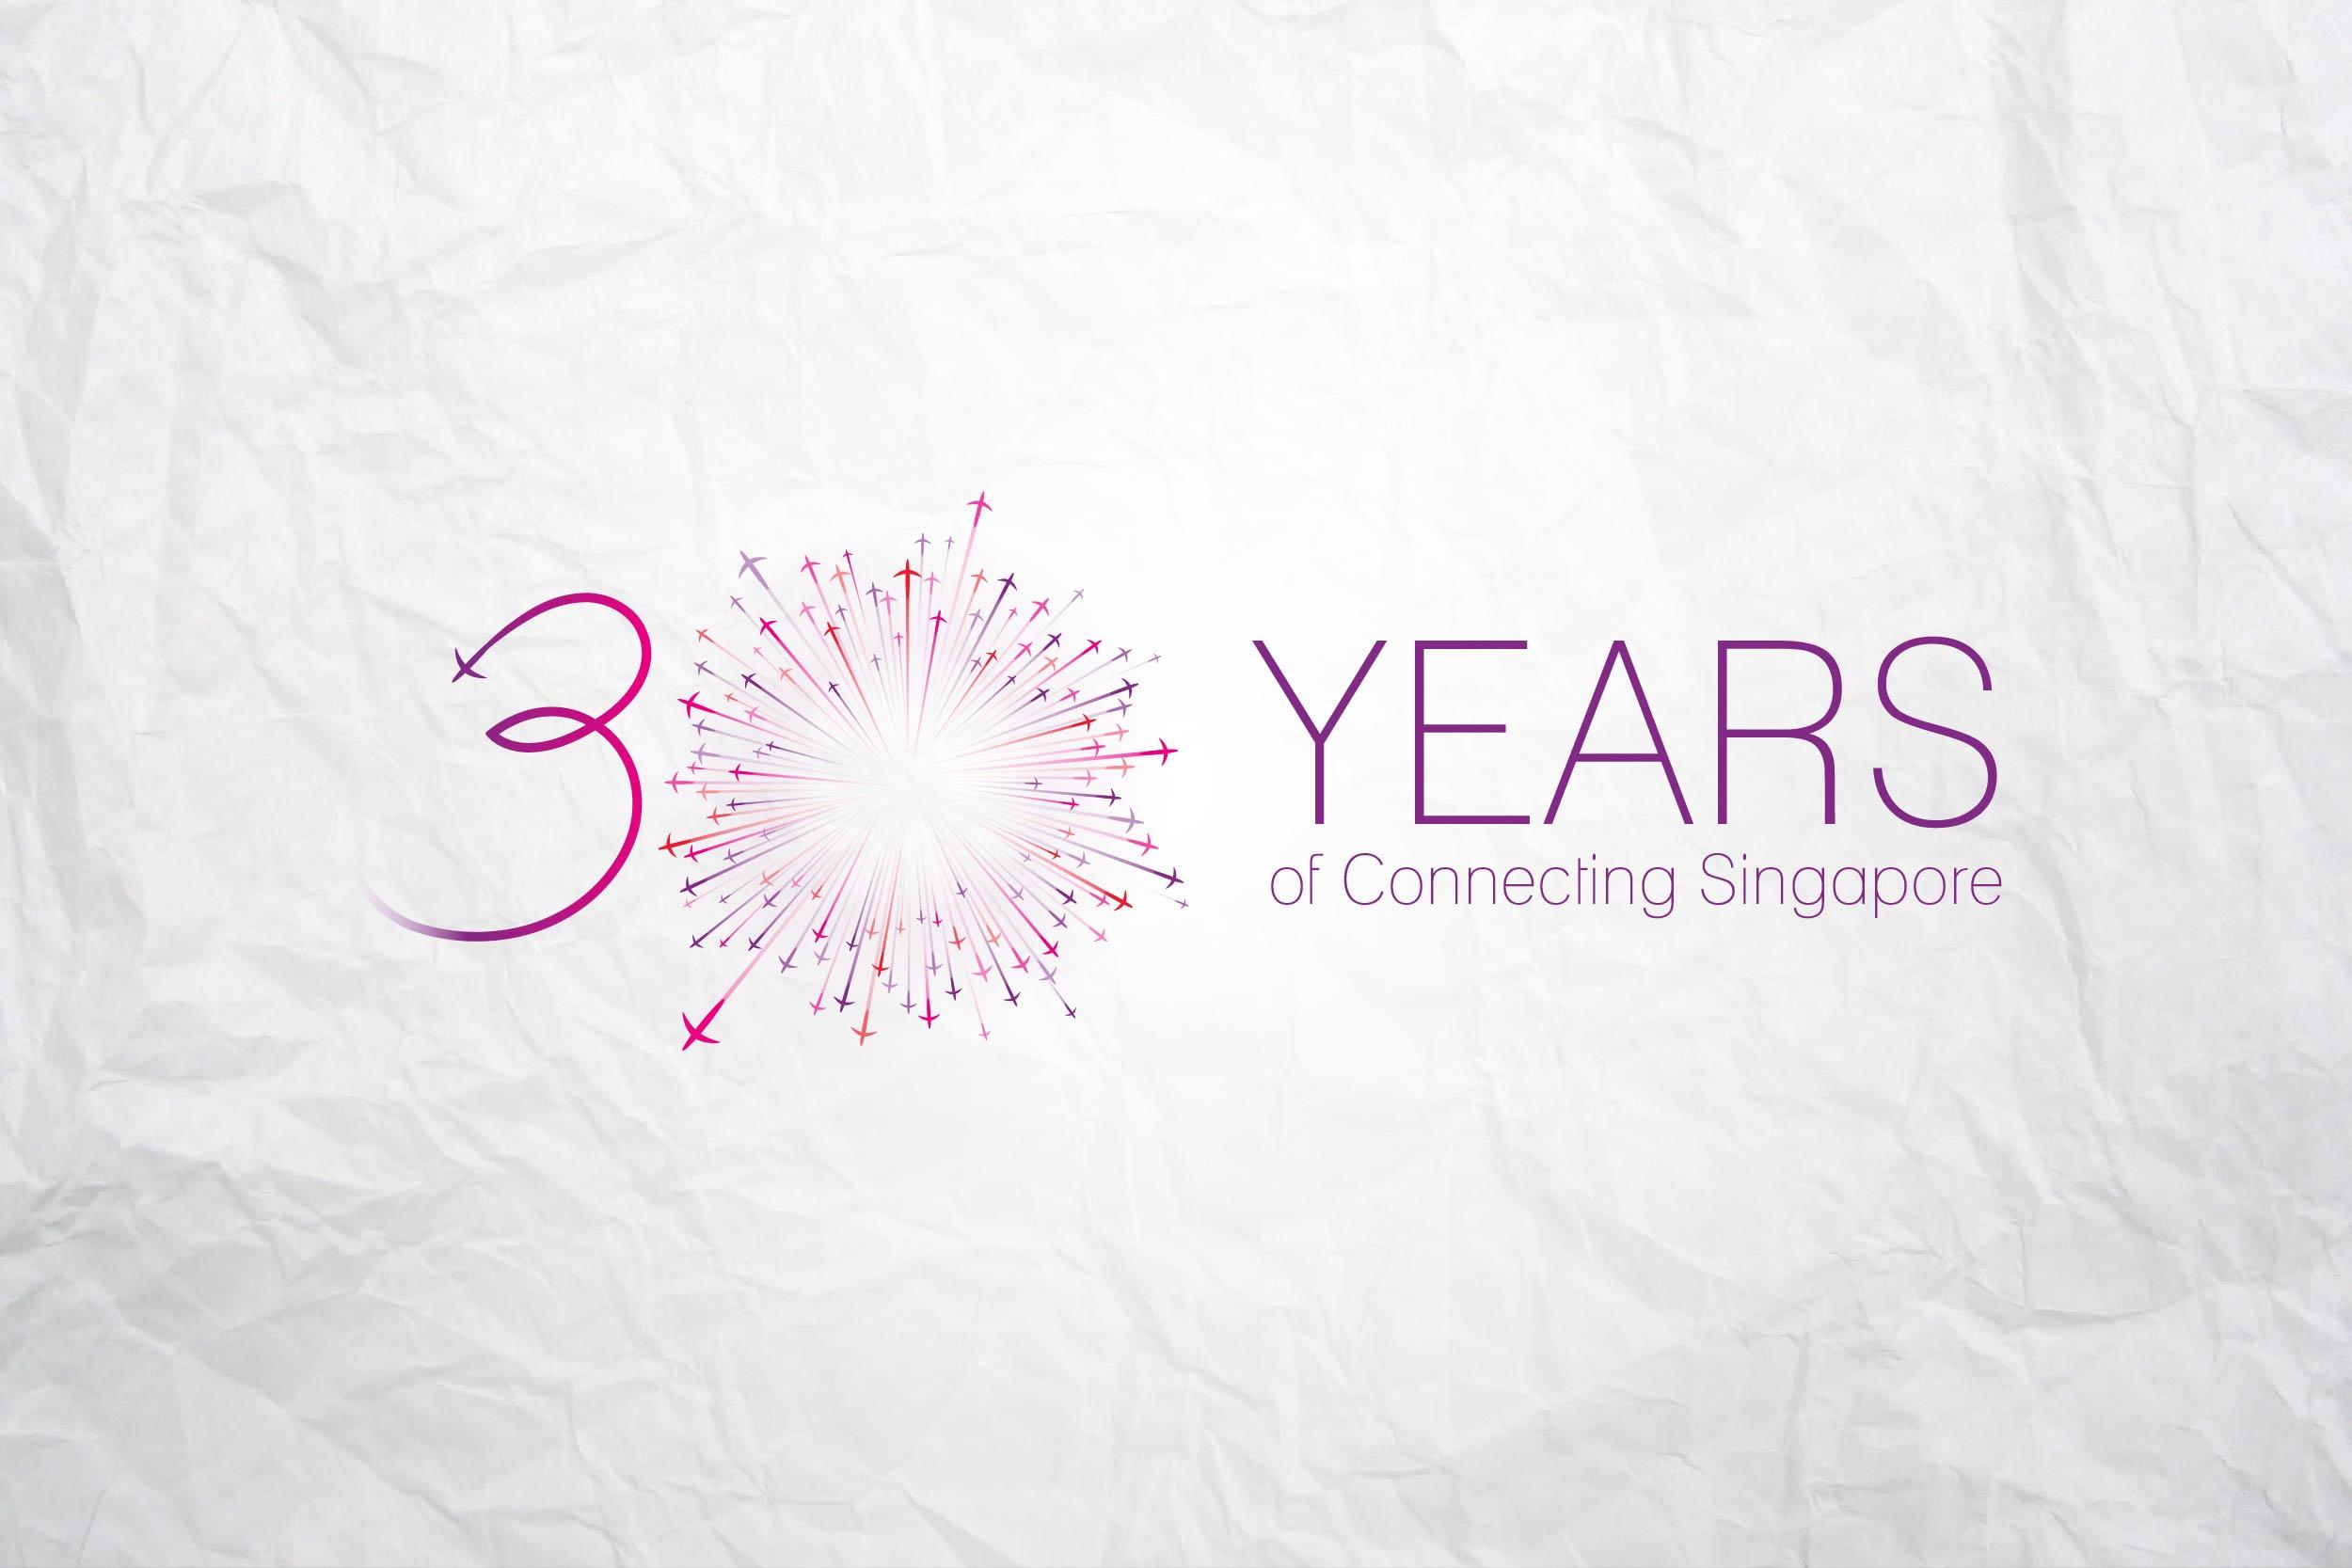 Changi Airport Group 30th Anniversary Logo Le Petite Minou